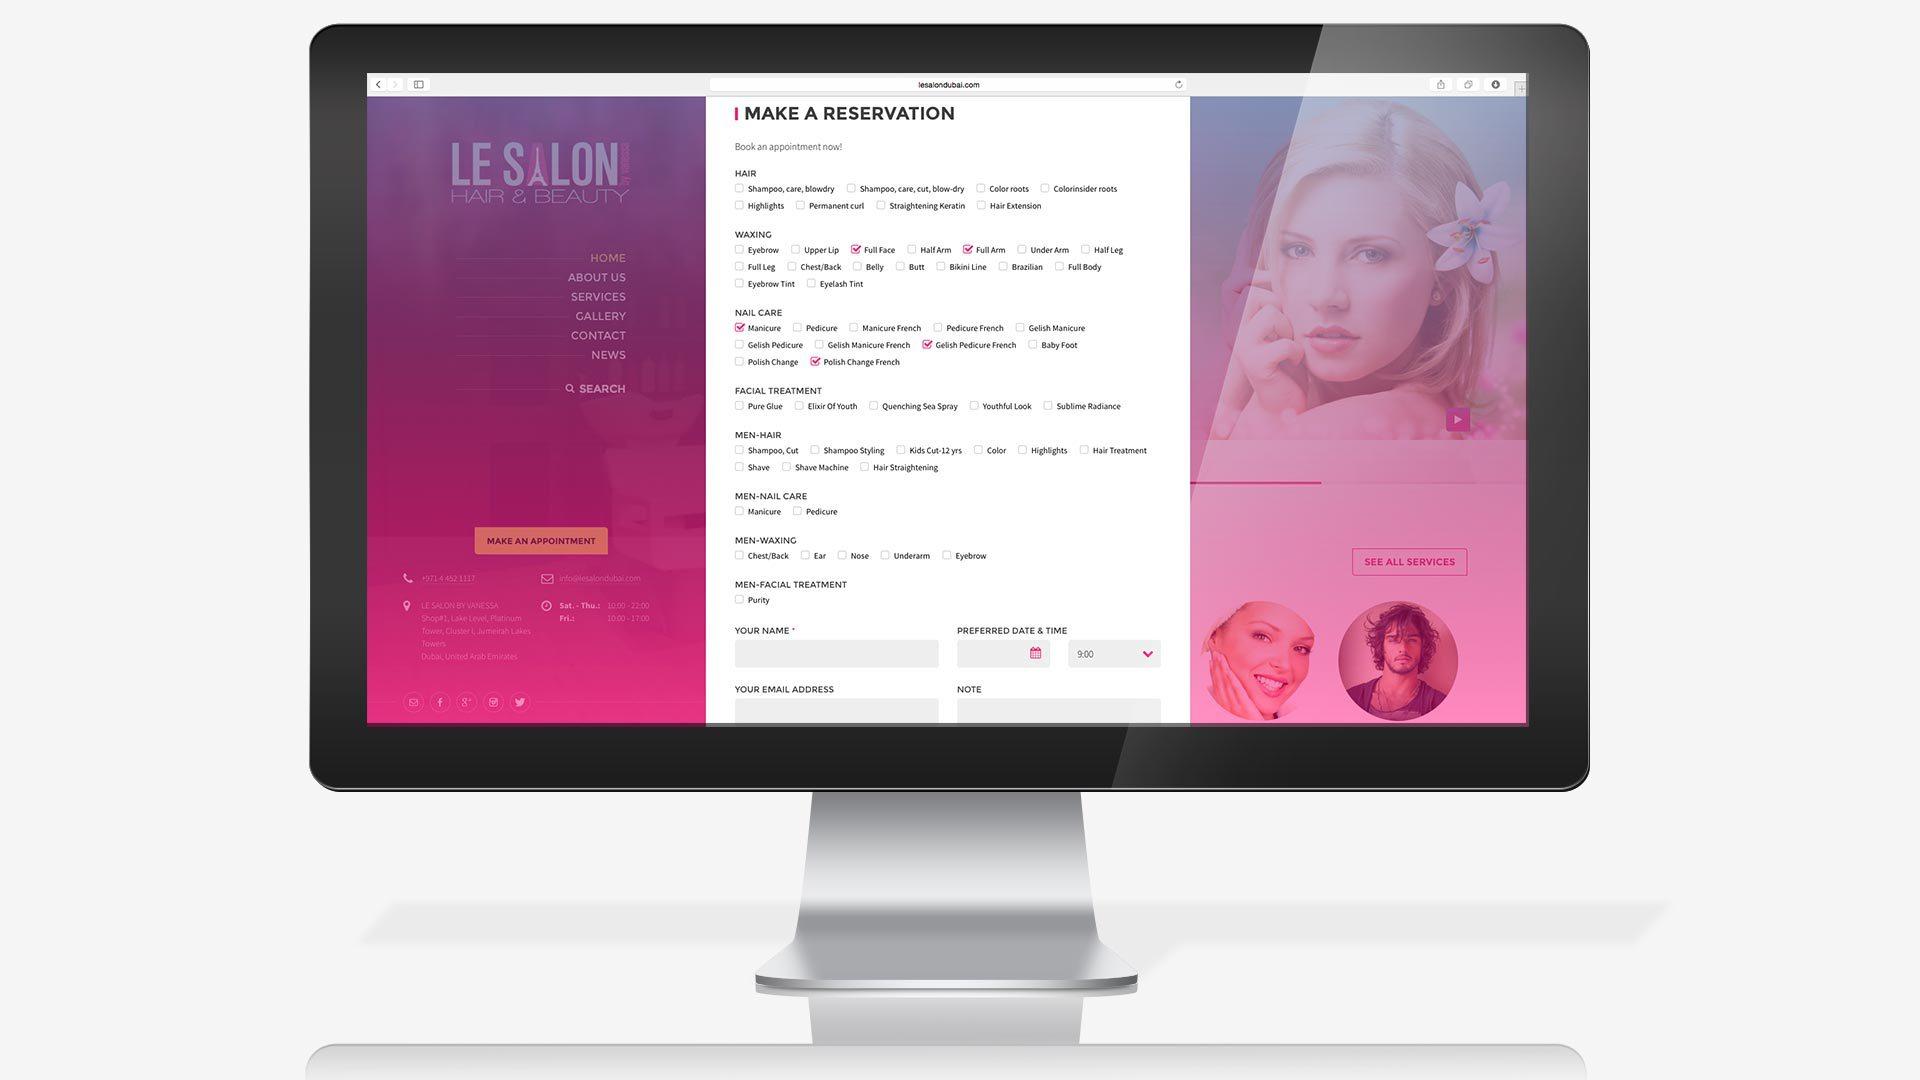 le-salon-website-reservation